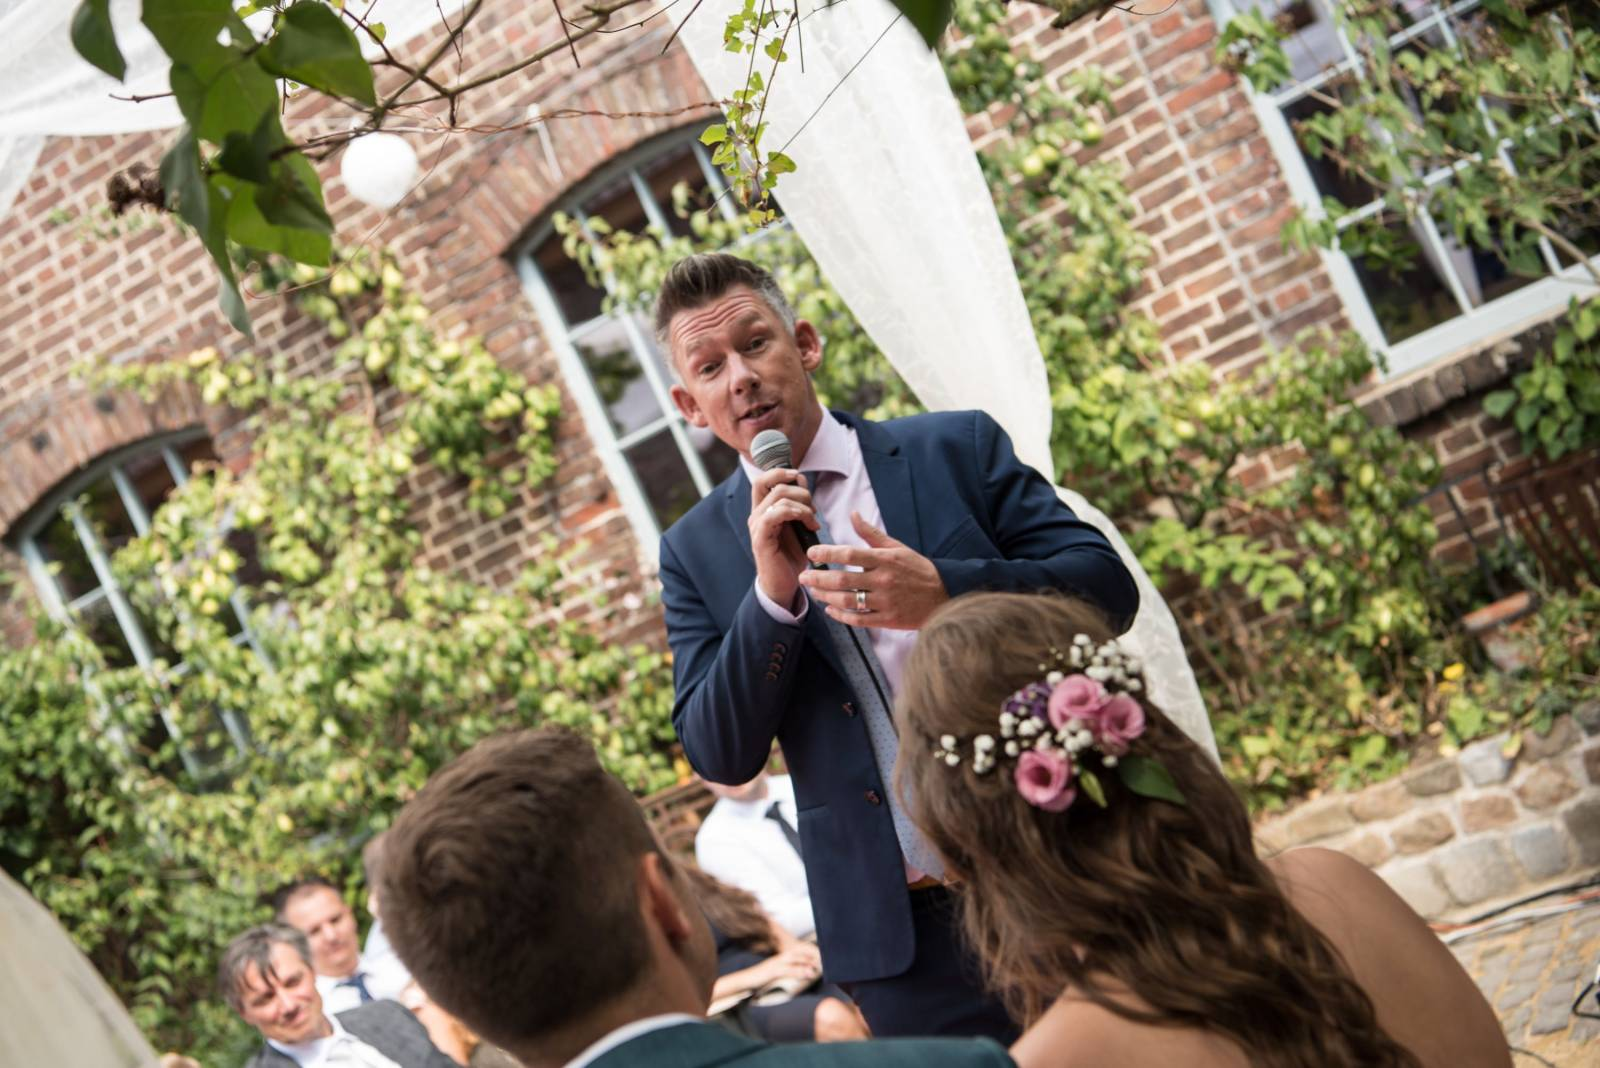 Live 4 Love - Ceremoniespreker - House of Weddings - 25